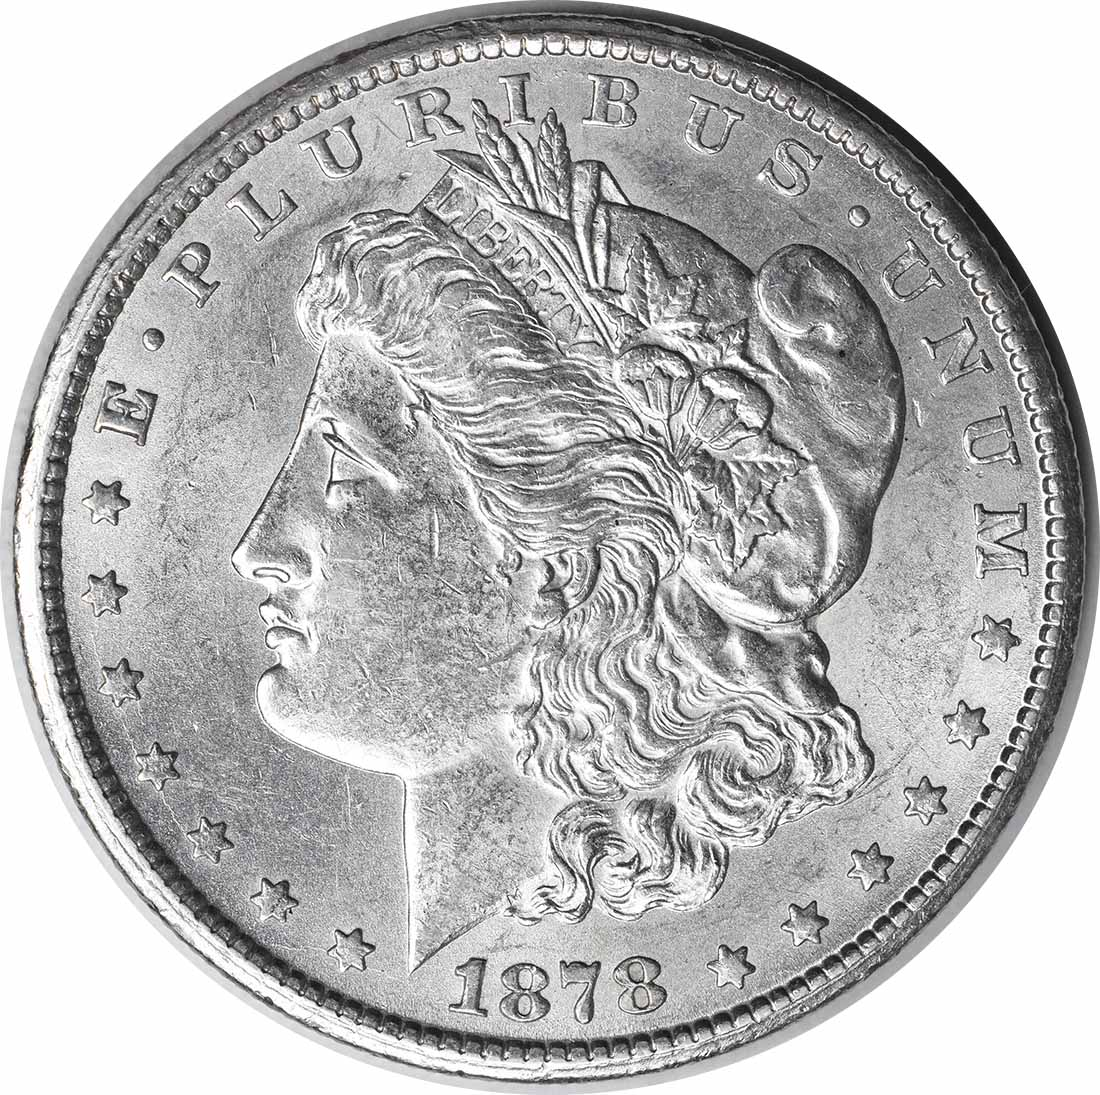 1878-CC Morgan Silver Dollar MS60 Uncertified #235